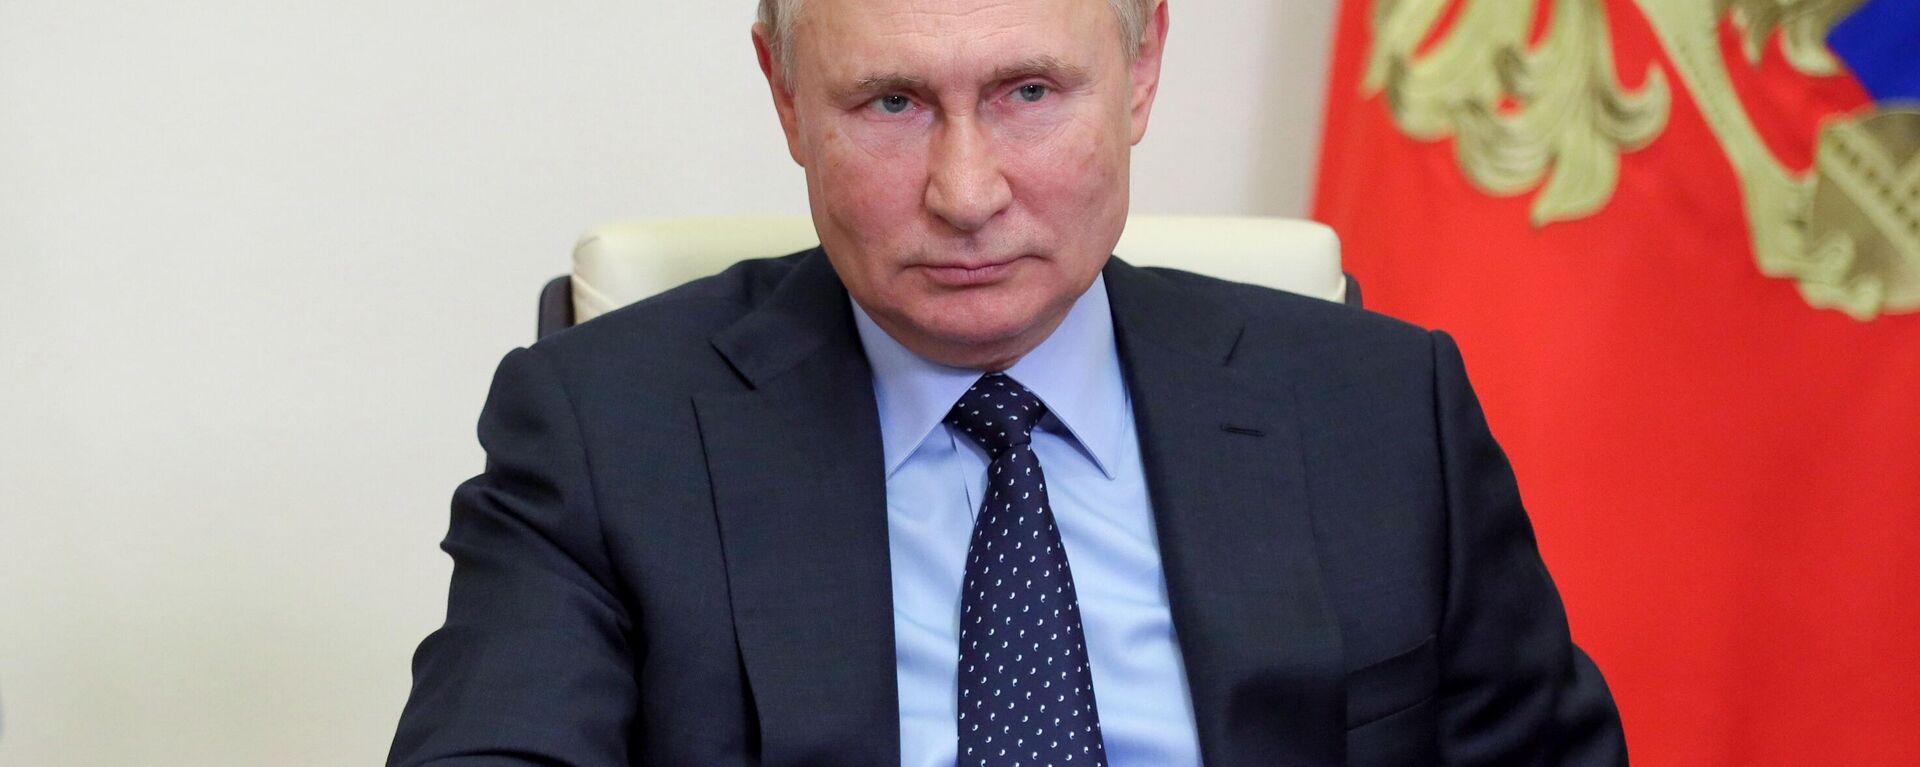 Президент России Владимир Путин  - Sputnik Таджикистан, 1920, 12.10.2021